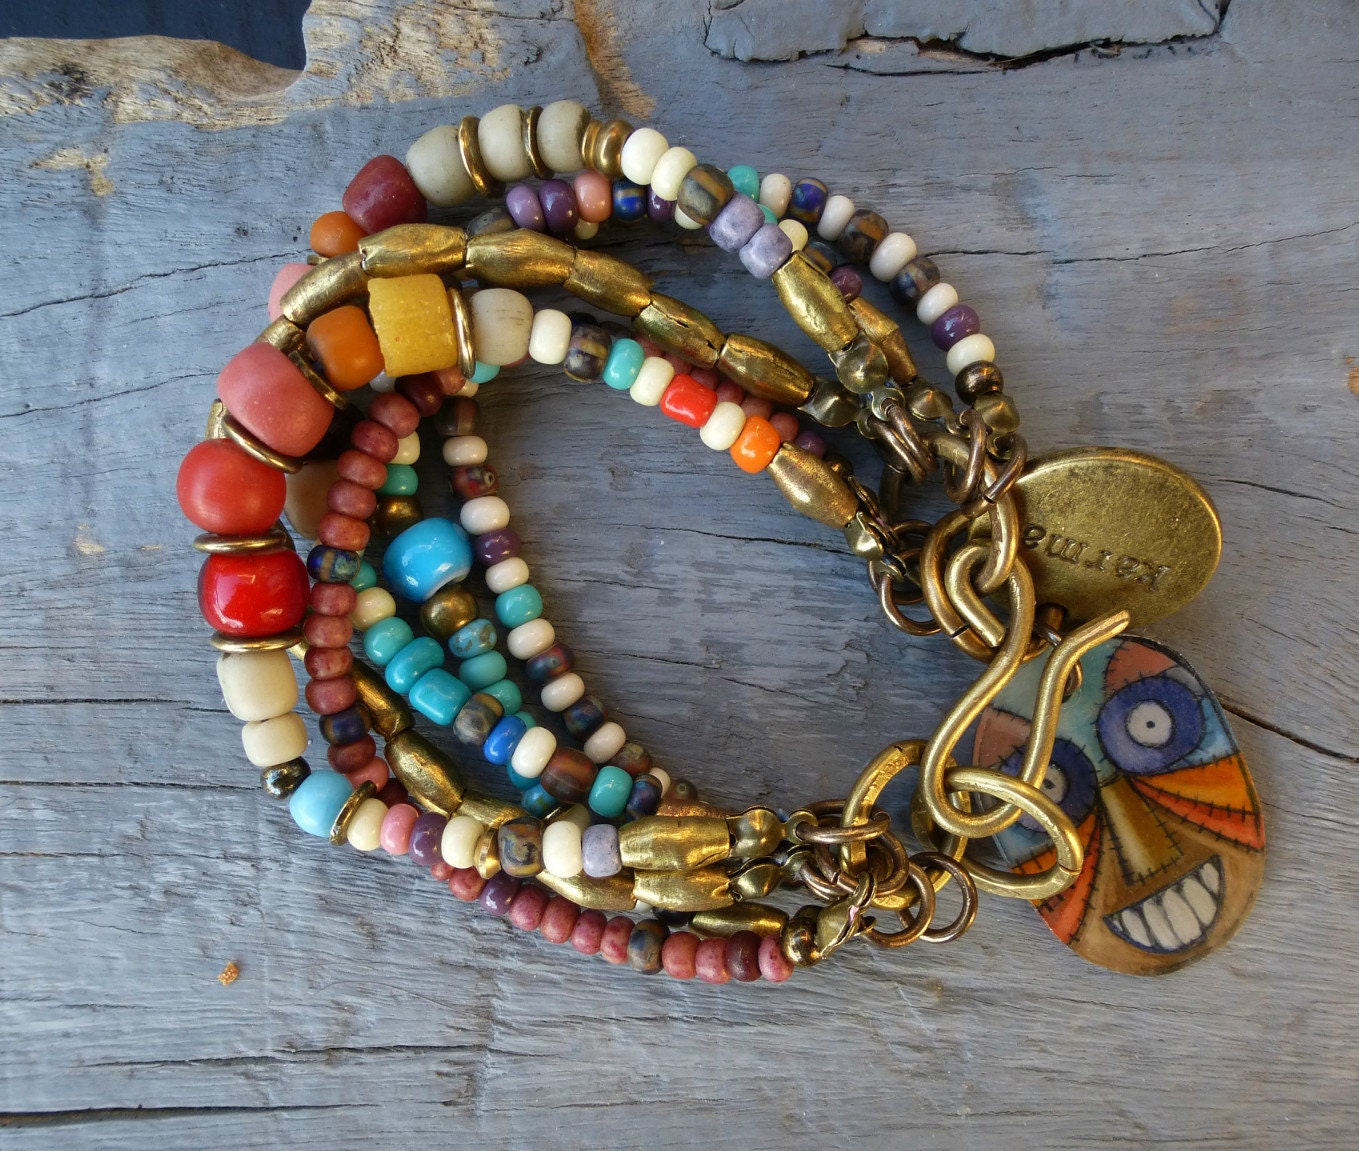 Beaded Charm Bracelets: Gypsy Bohemian Six Strand Beaded Charm Bracelet HAPPY